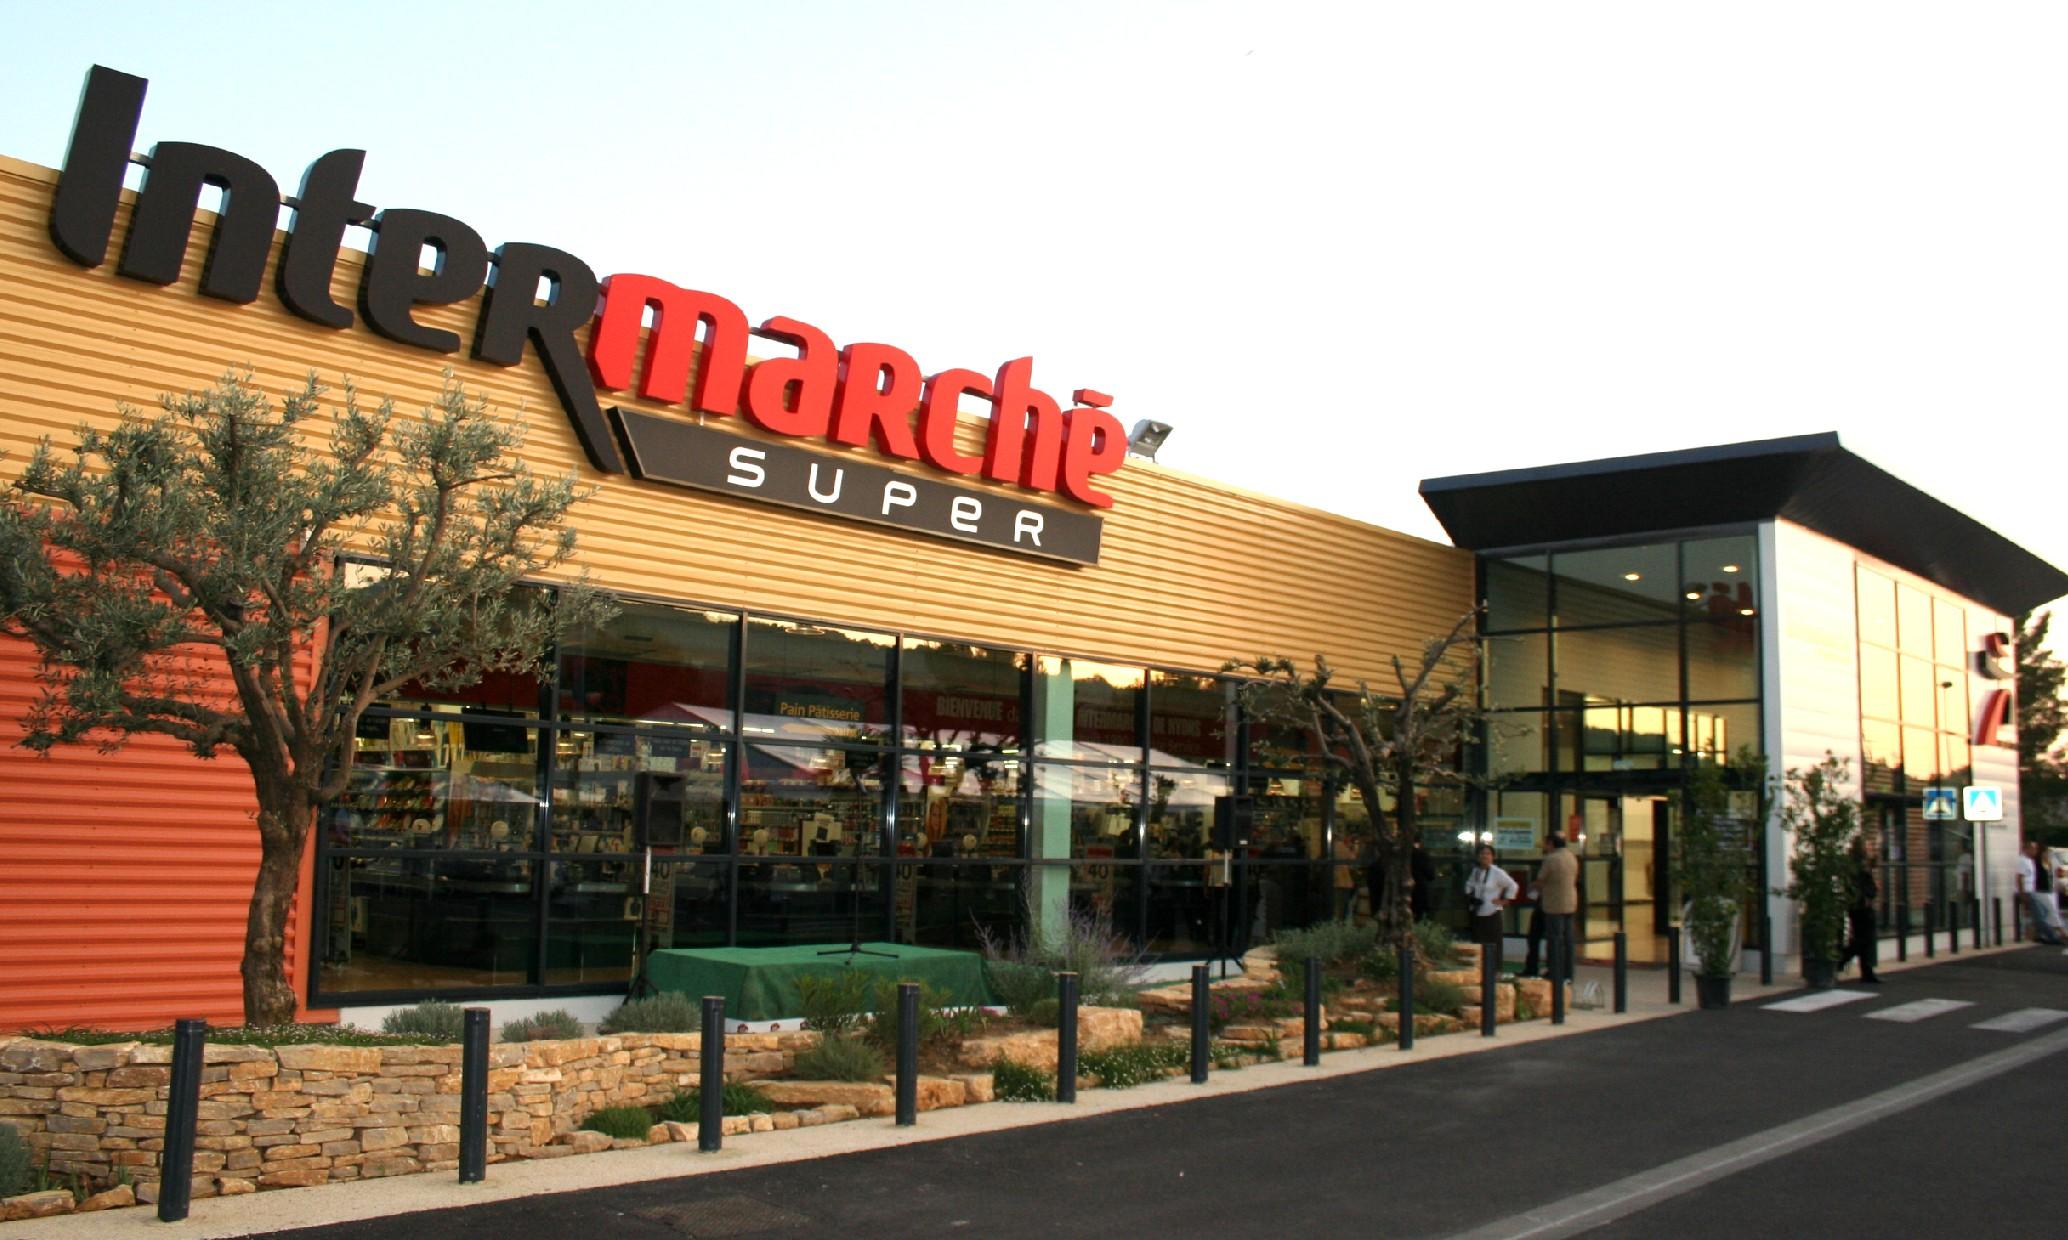 Intermarche revenues grow 1.7% in 2014 - Undercurrent News